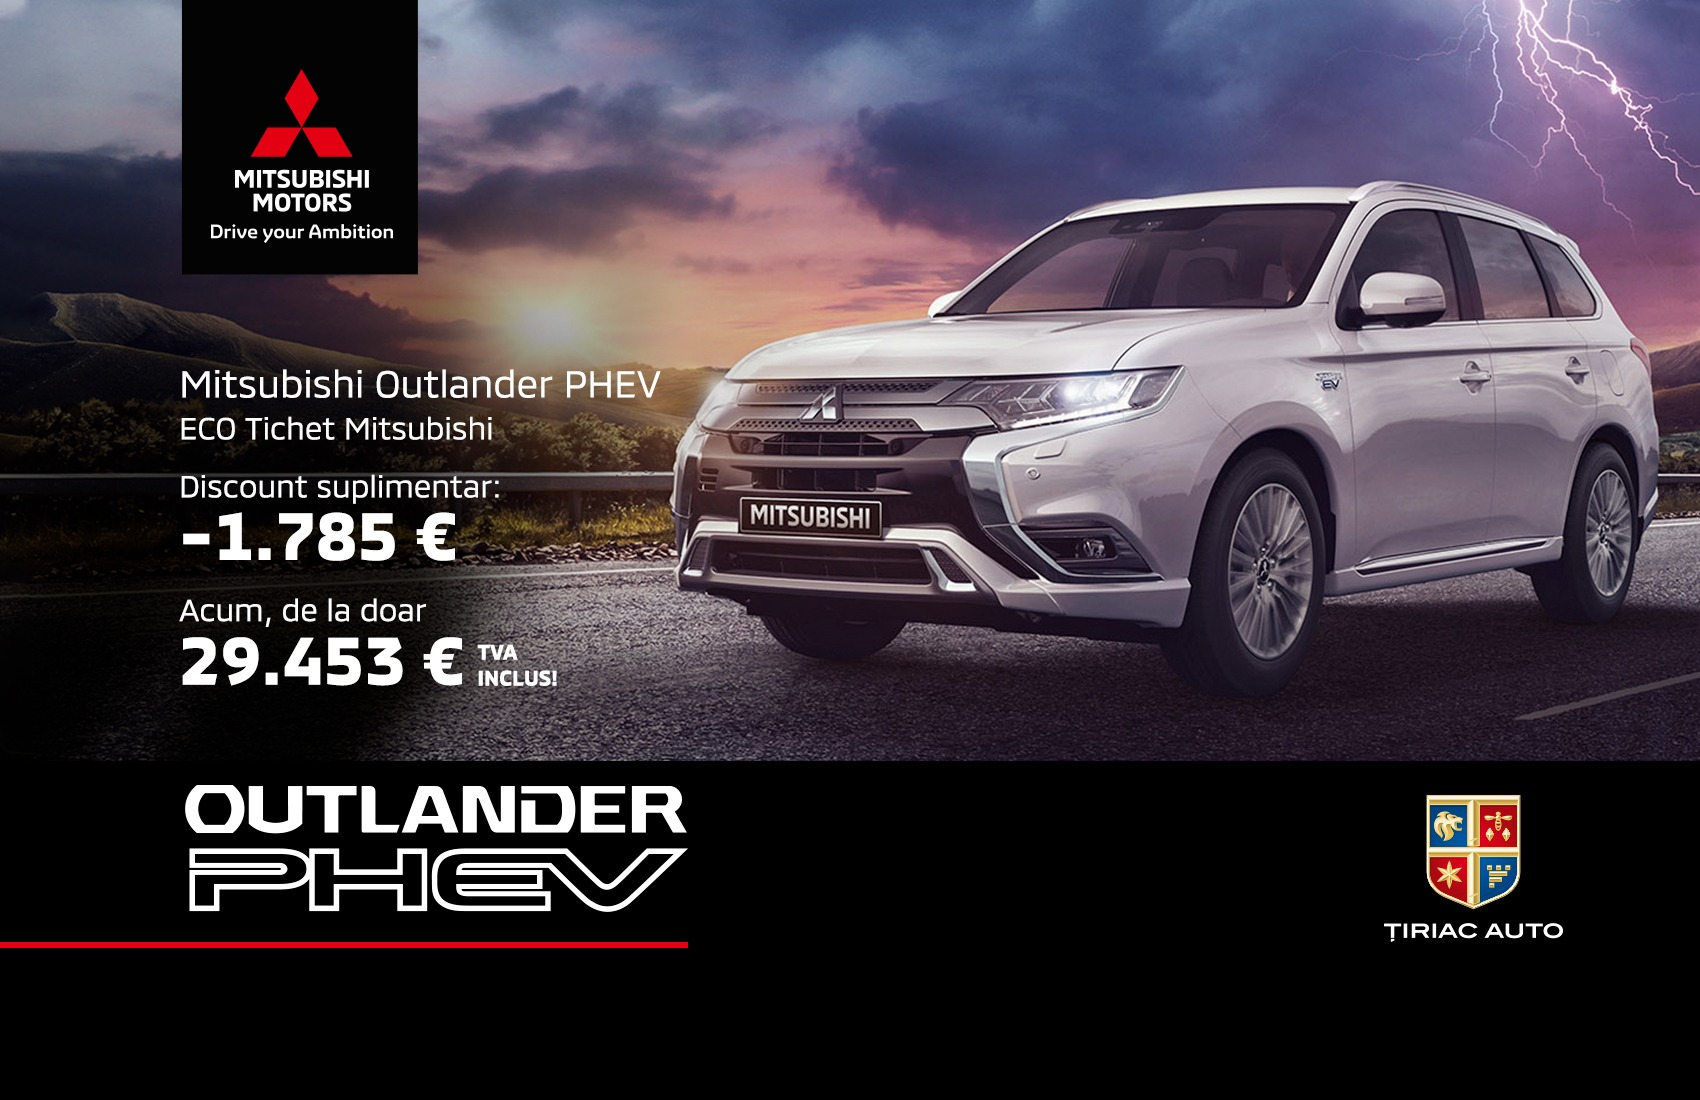 Descopera oferta Mitsubishi Outlander PHEV